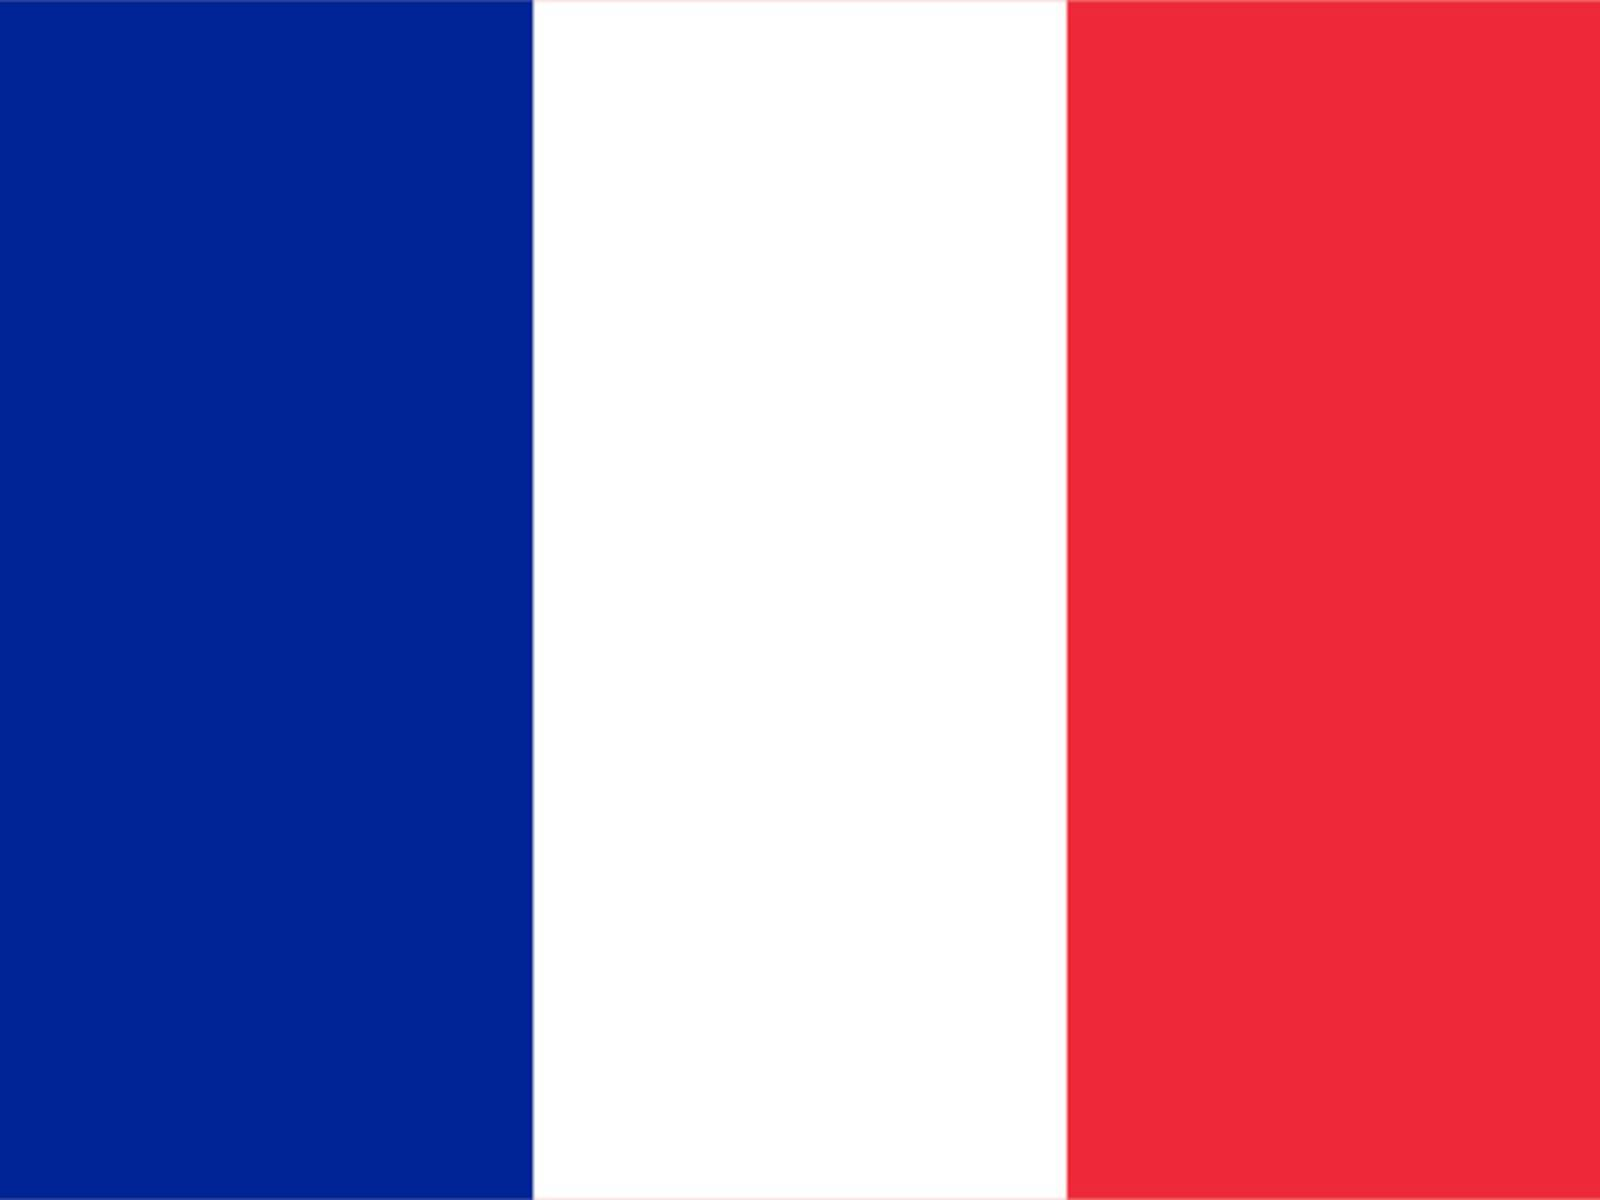 Flagge Frankreichs